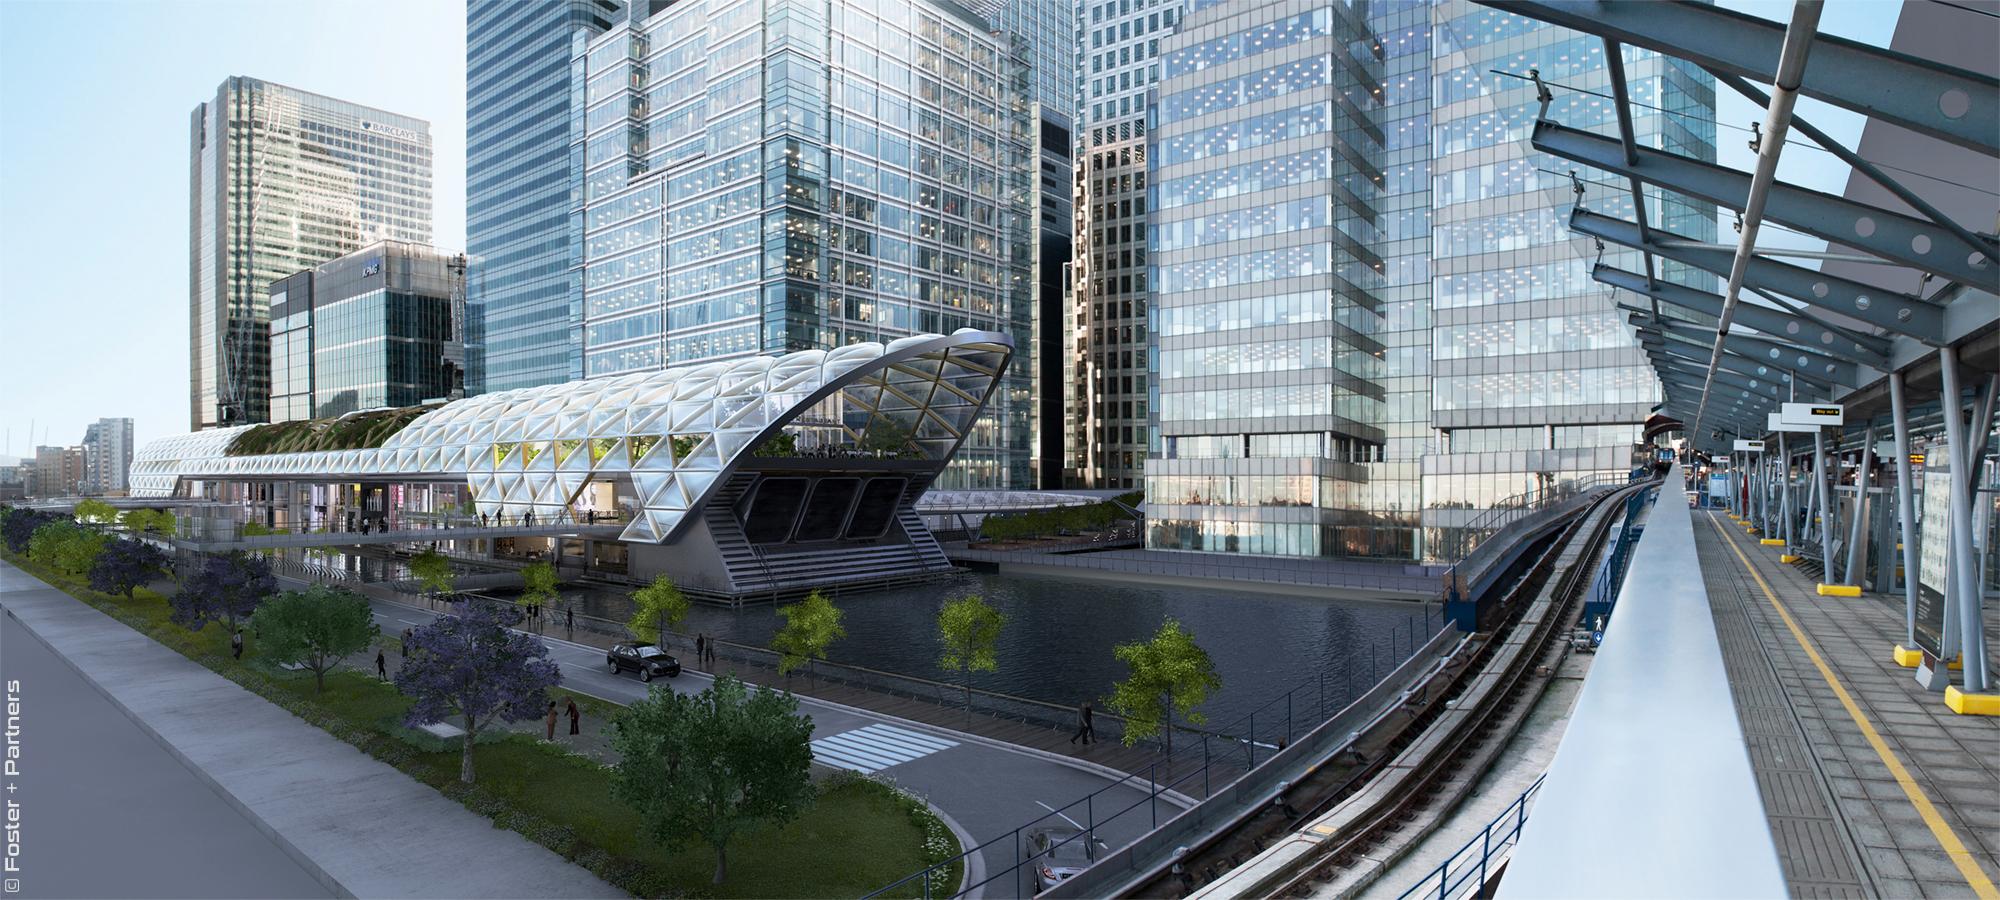 Crossrail Station Canary Wharf